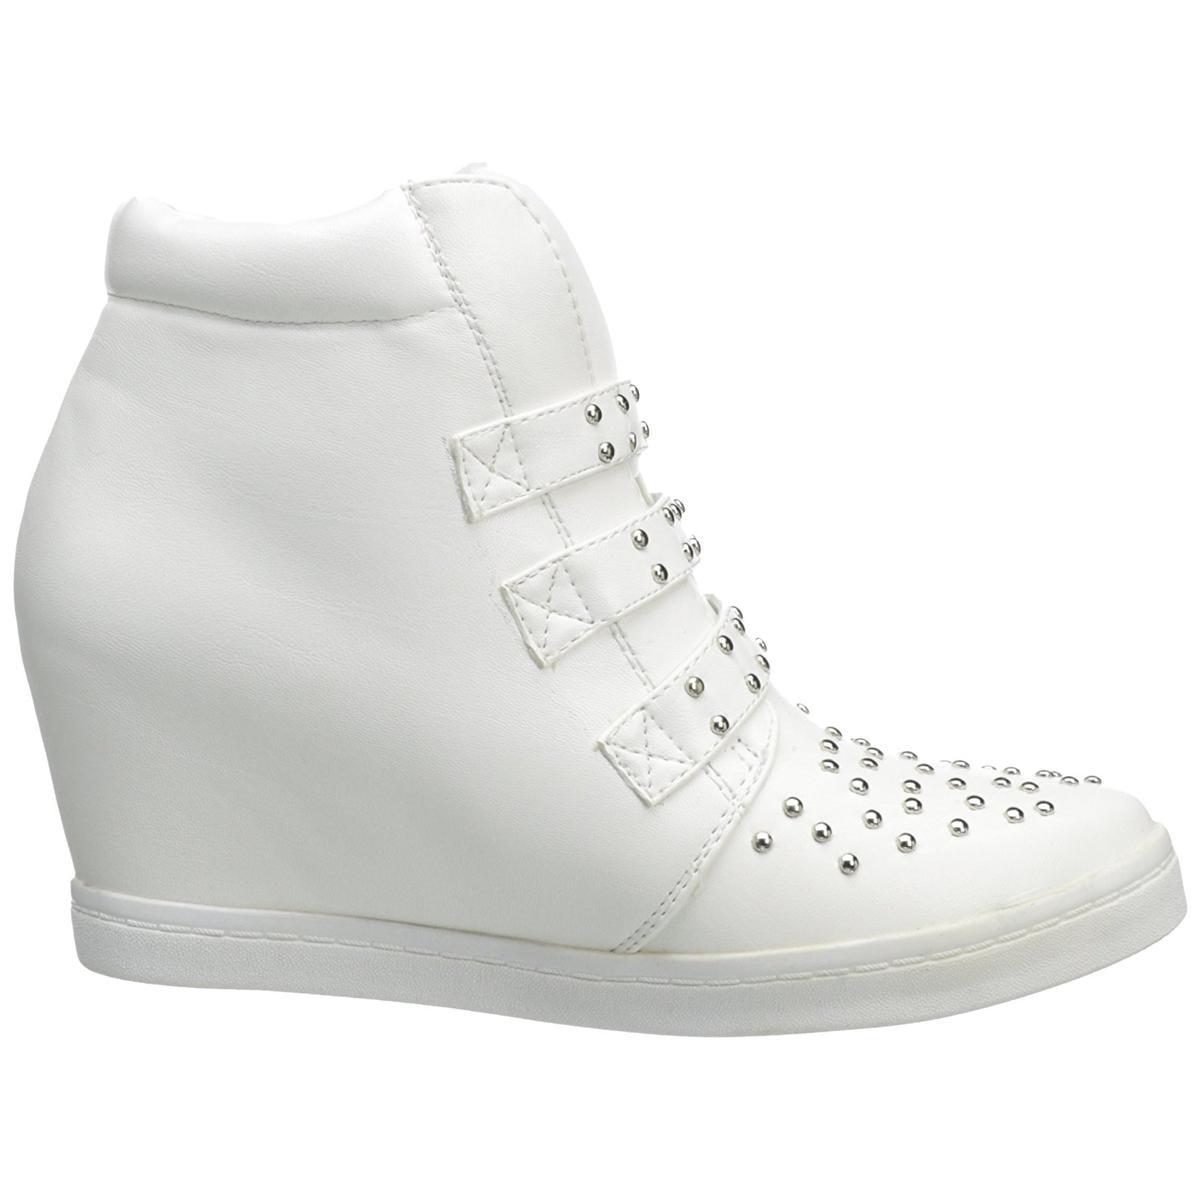 N.Y.L.A Women's Buckley White Wedge Fashion Sneakers